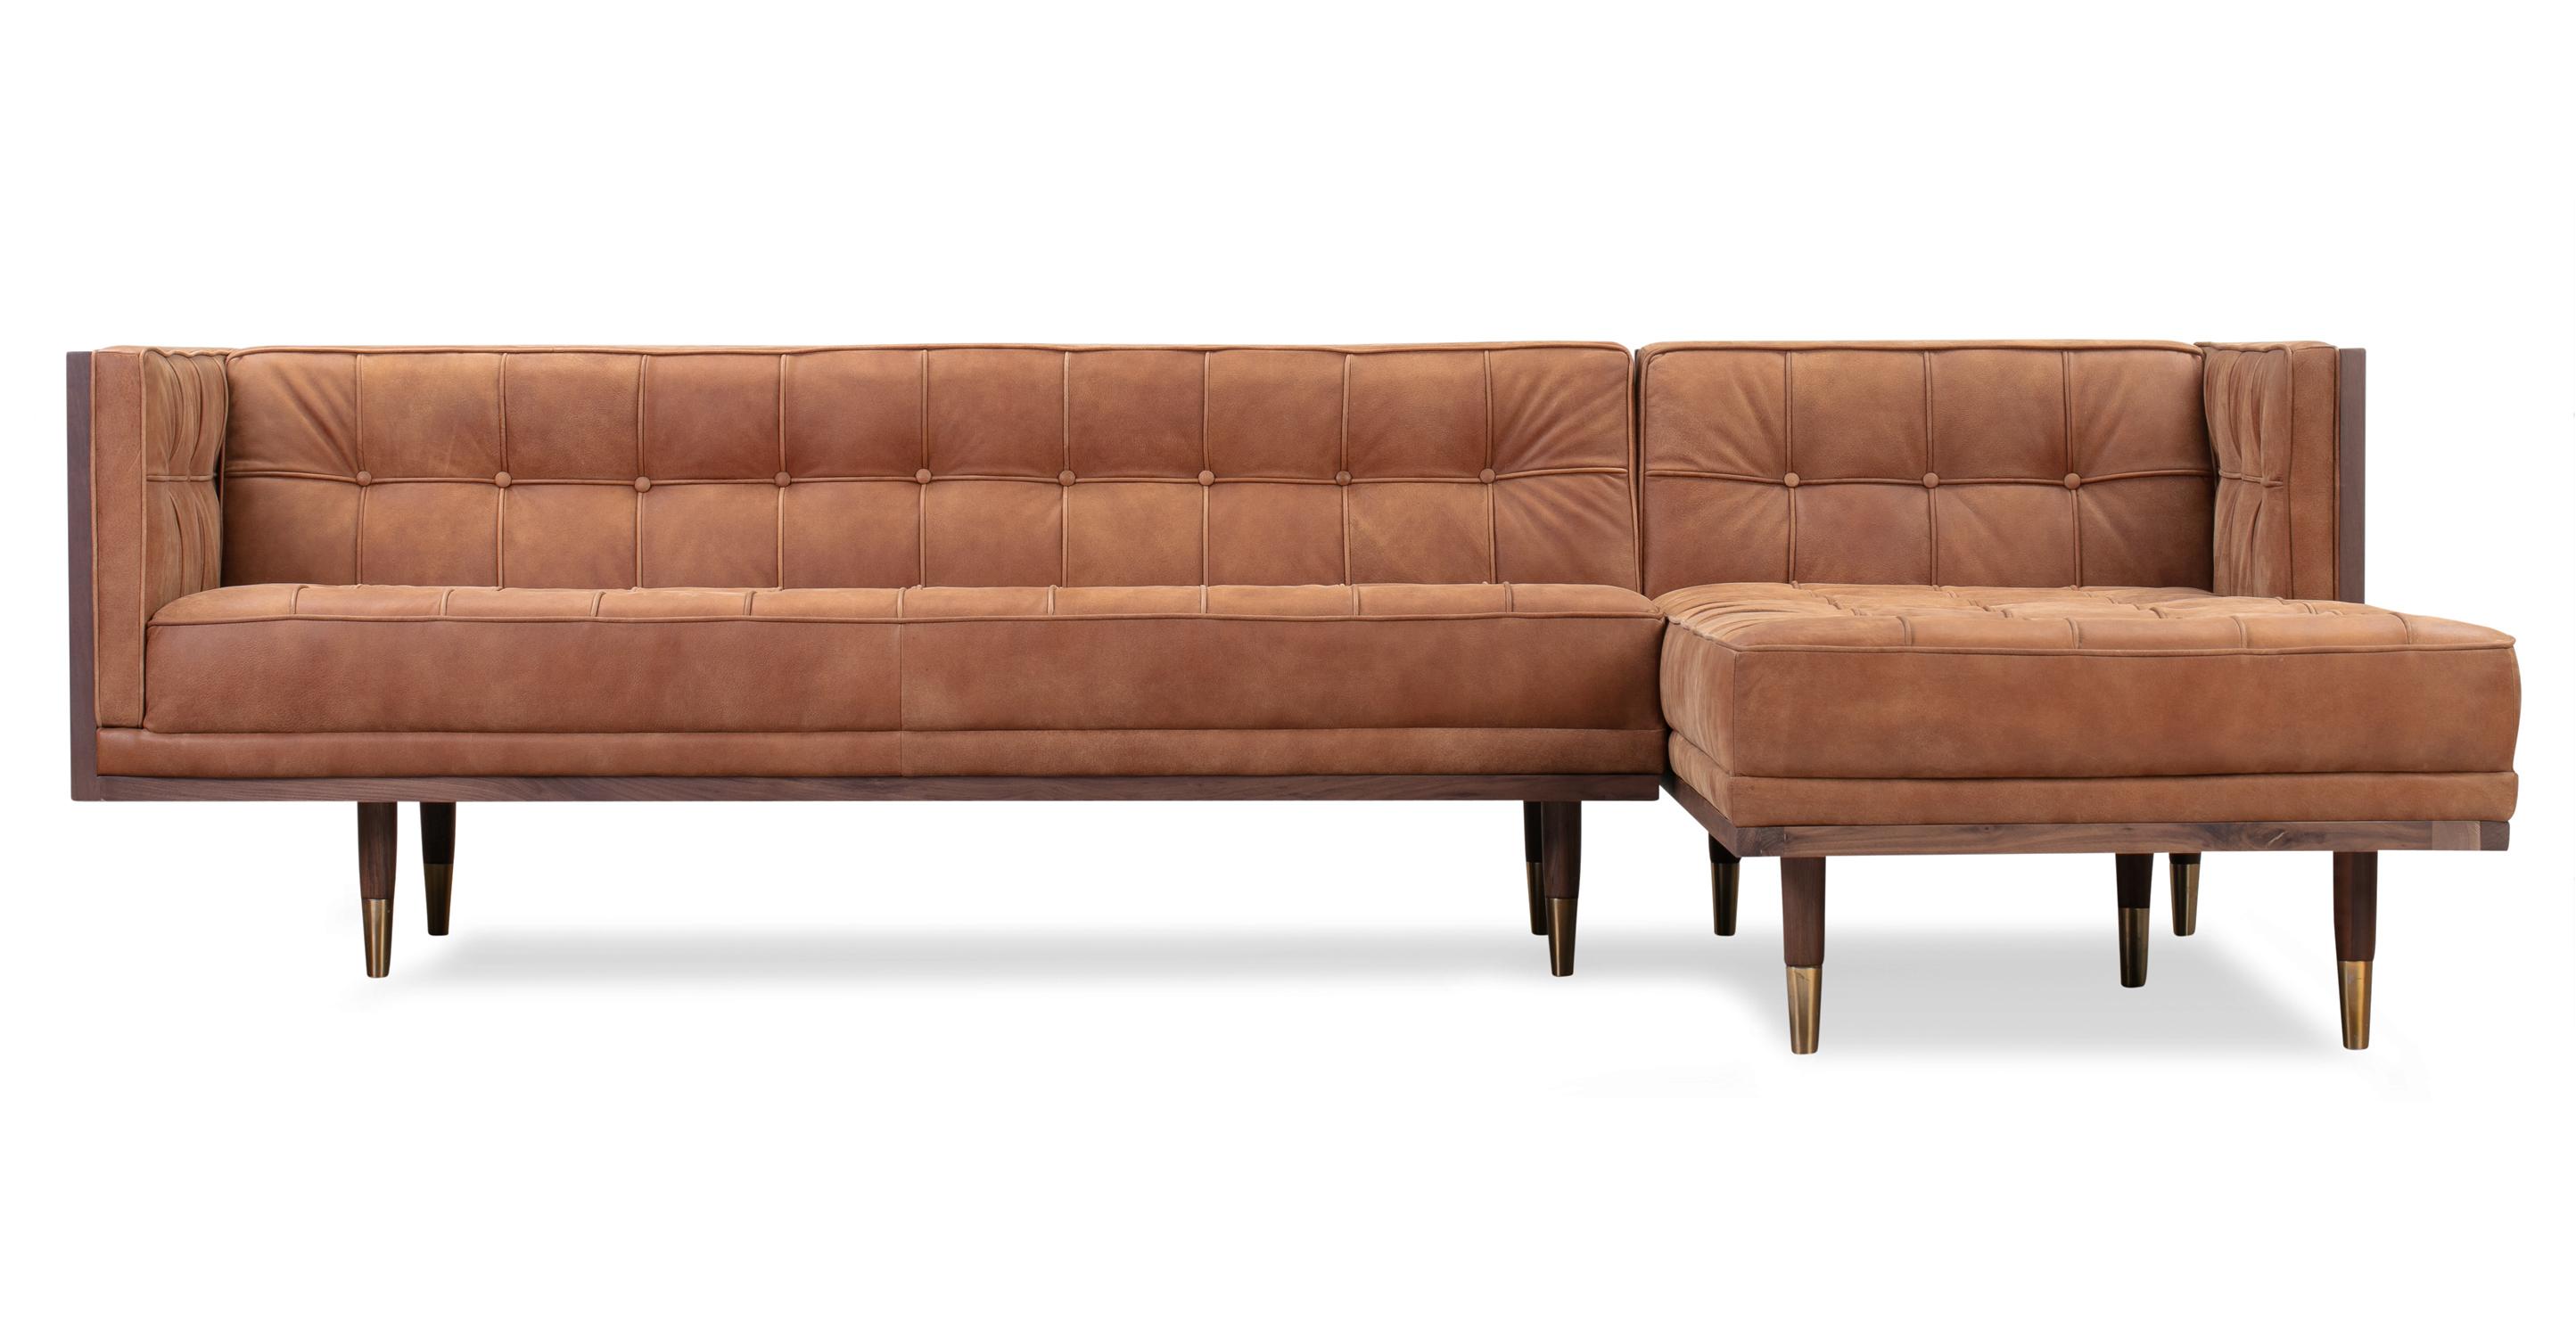 "Woodrow Box 100"" Leather Sofa Sectional Right, Walnut/Cognac"